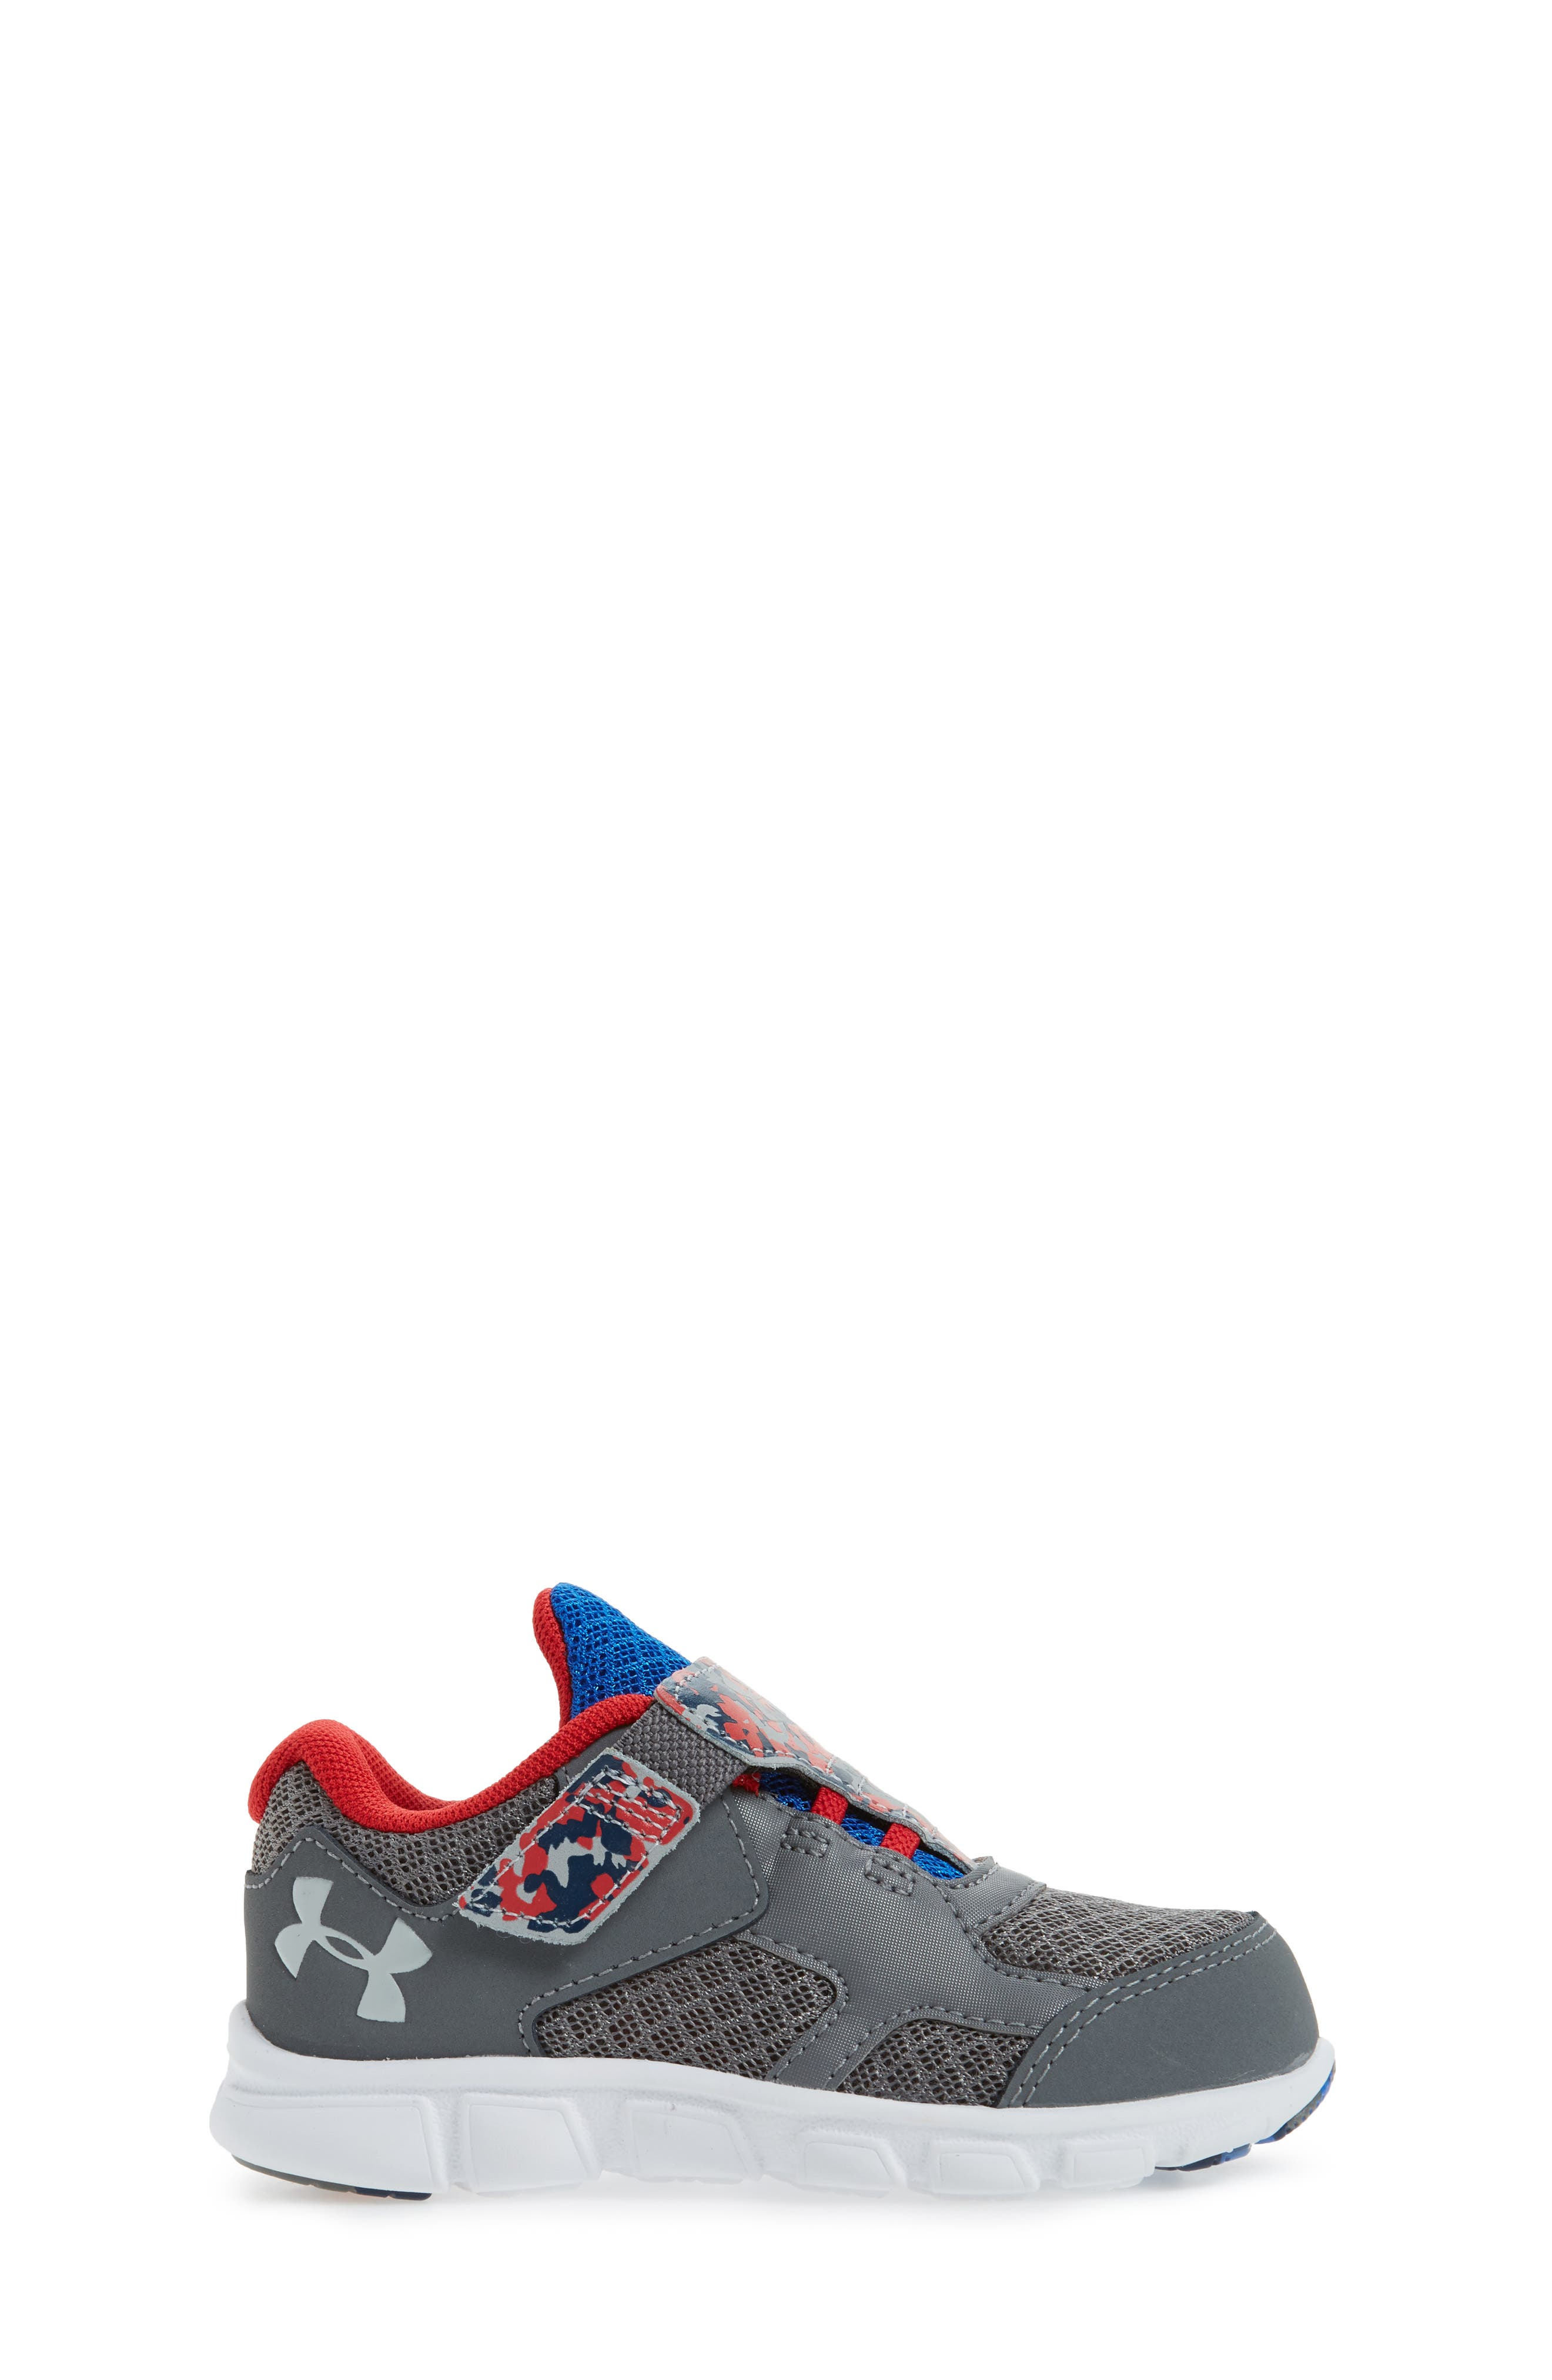 Engage II Athletic Shoe,                             Alternate thumbnail 3, color,                             020